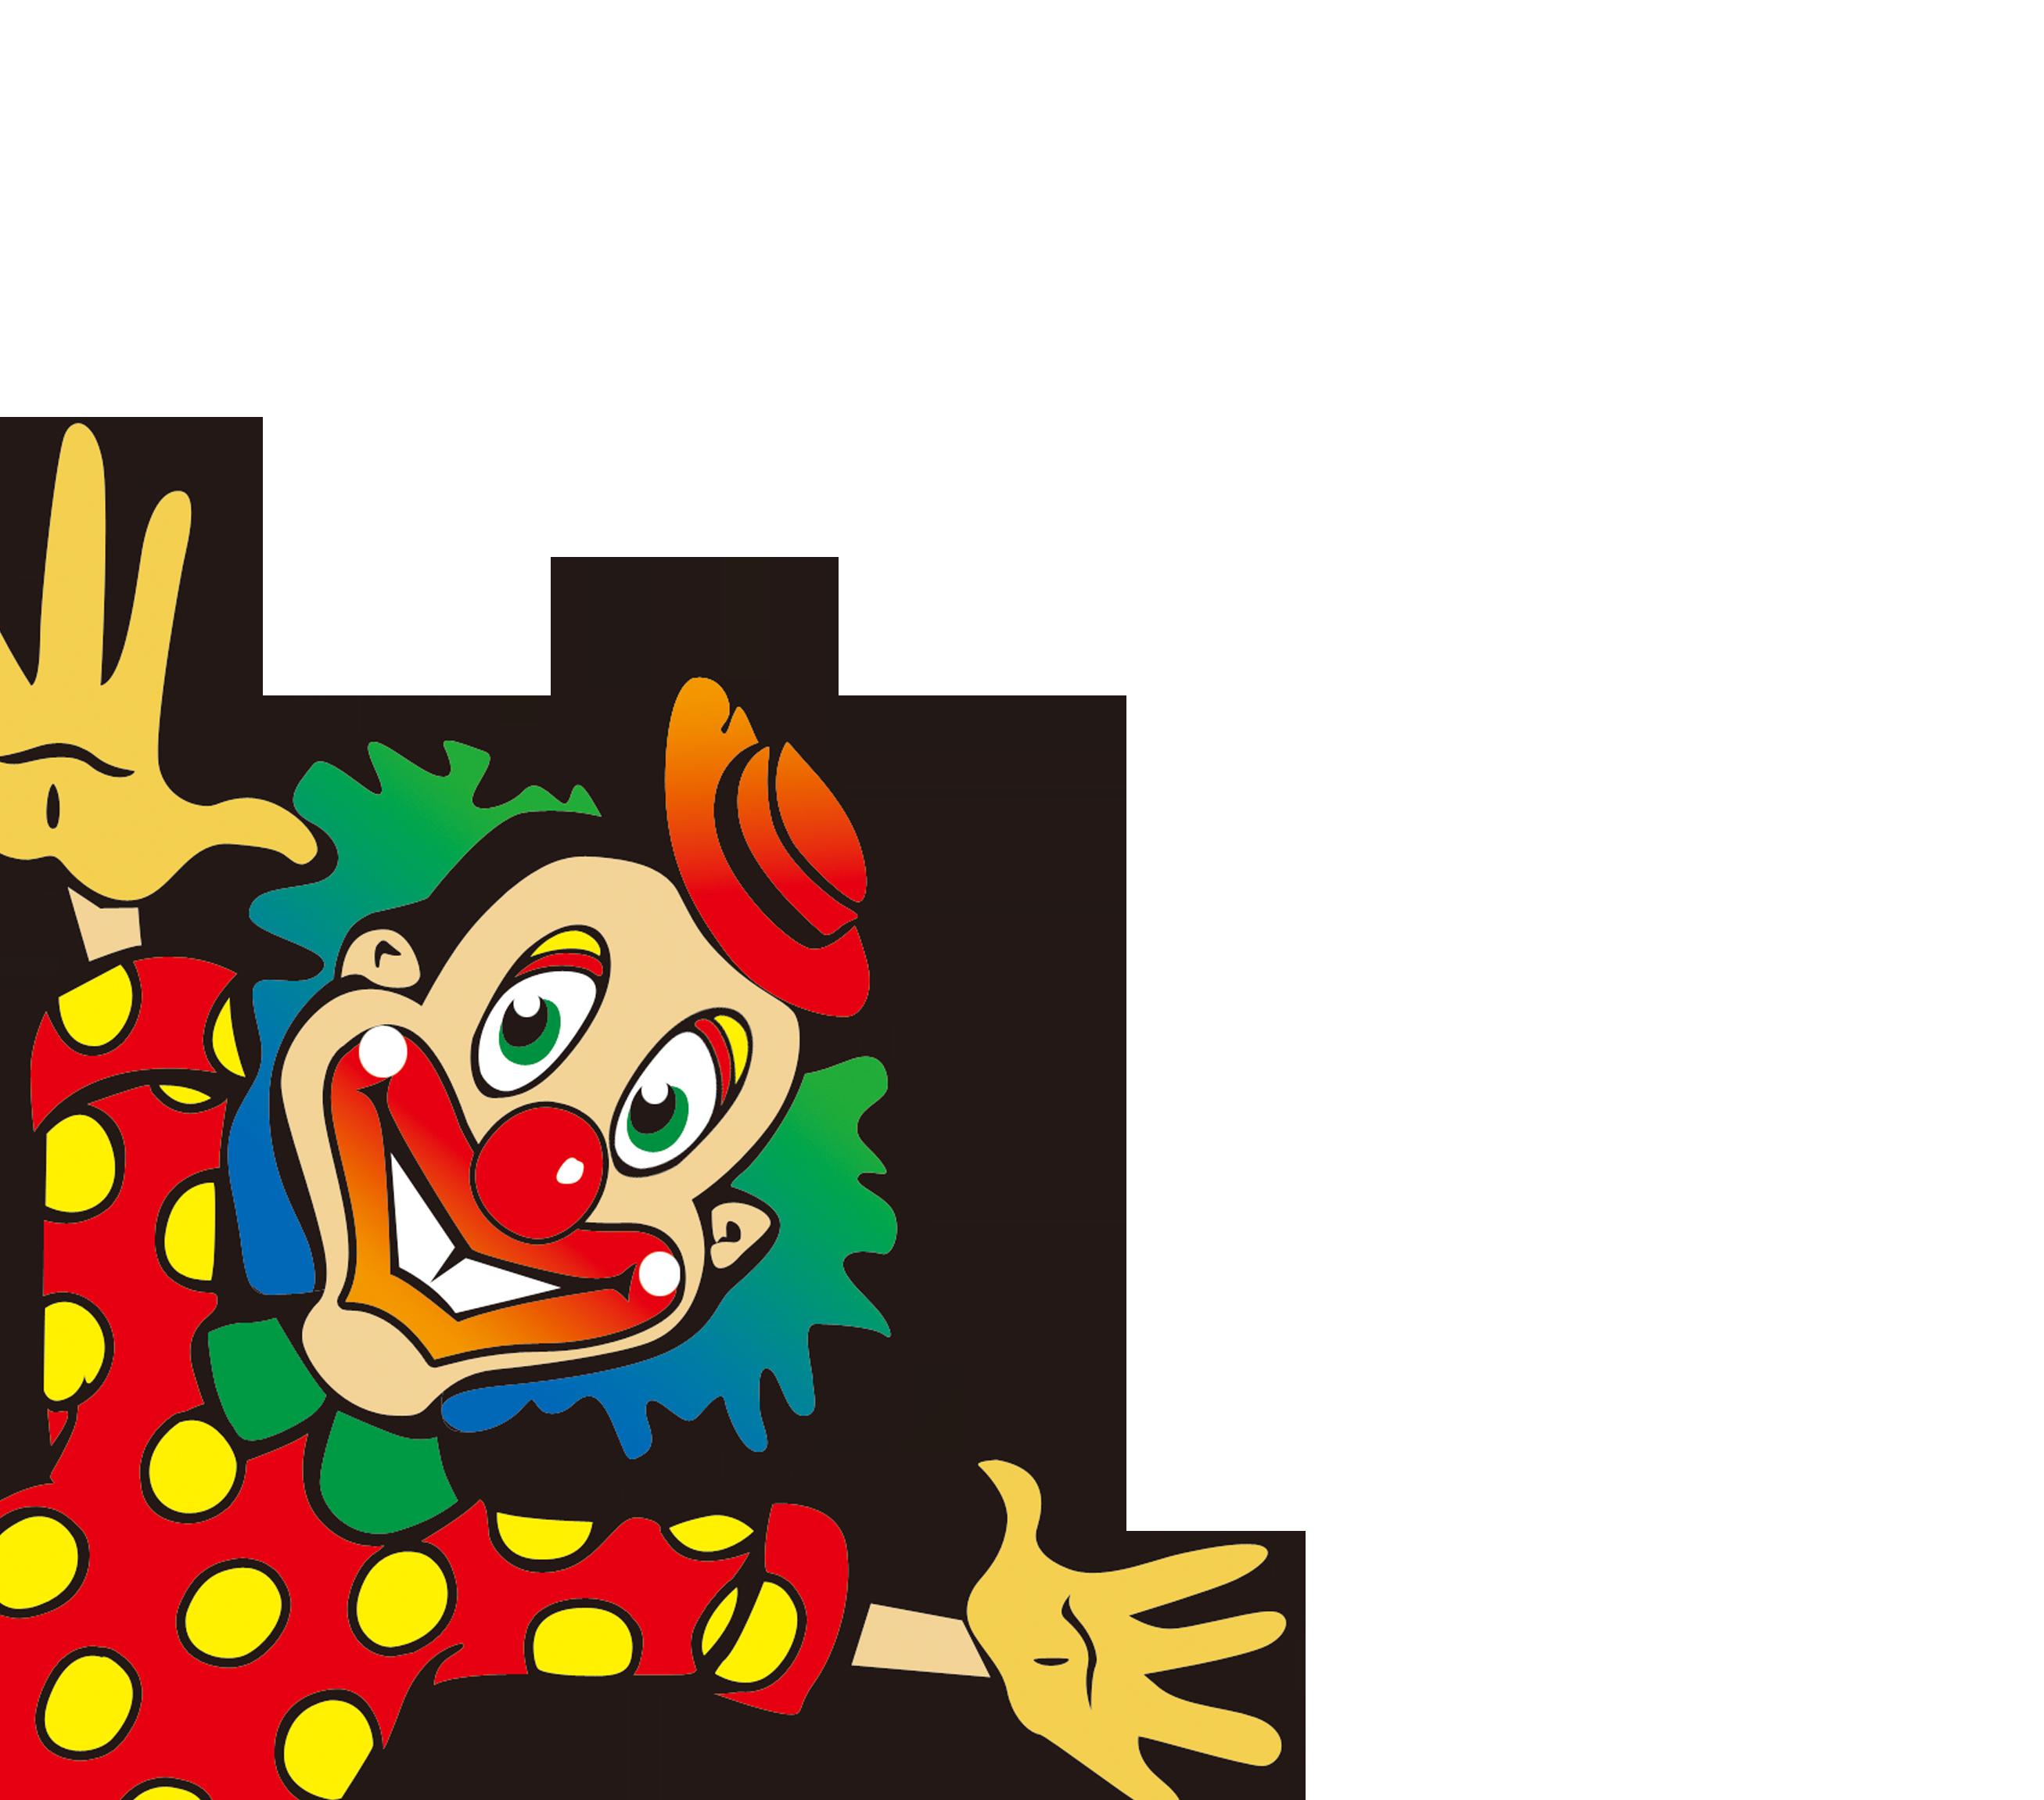 April fools day clip art free banner transparent stock April Fools Day April 1 Festival Joke - Cartoon clown 2613*2301 ... banner transparent stock